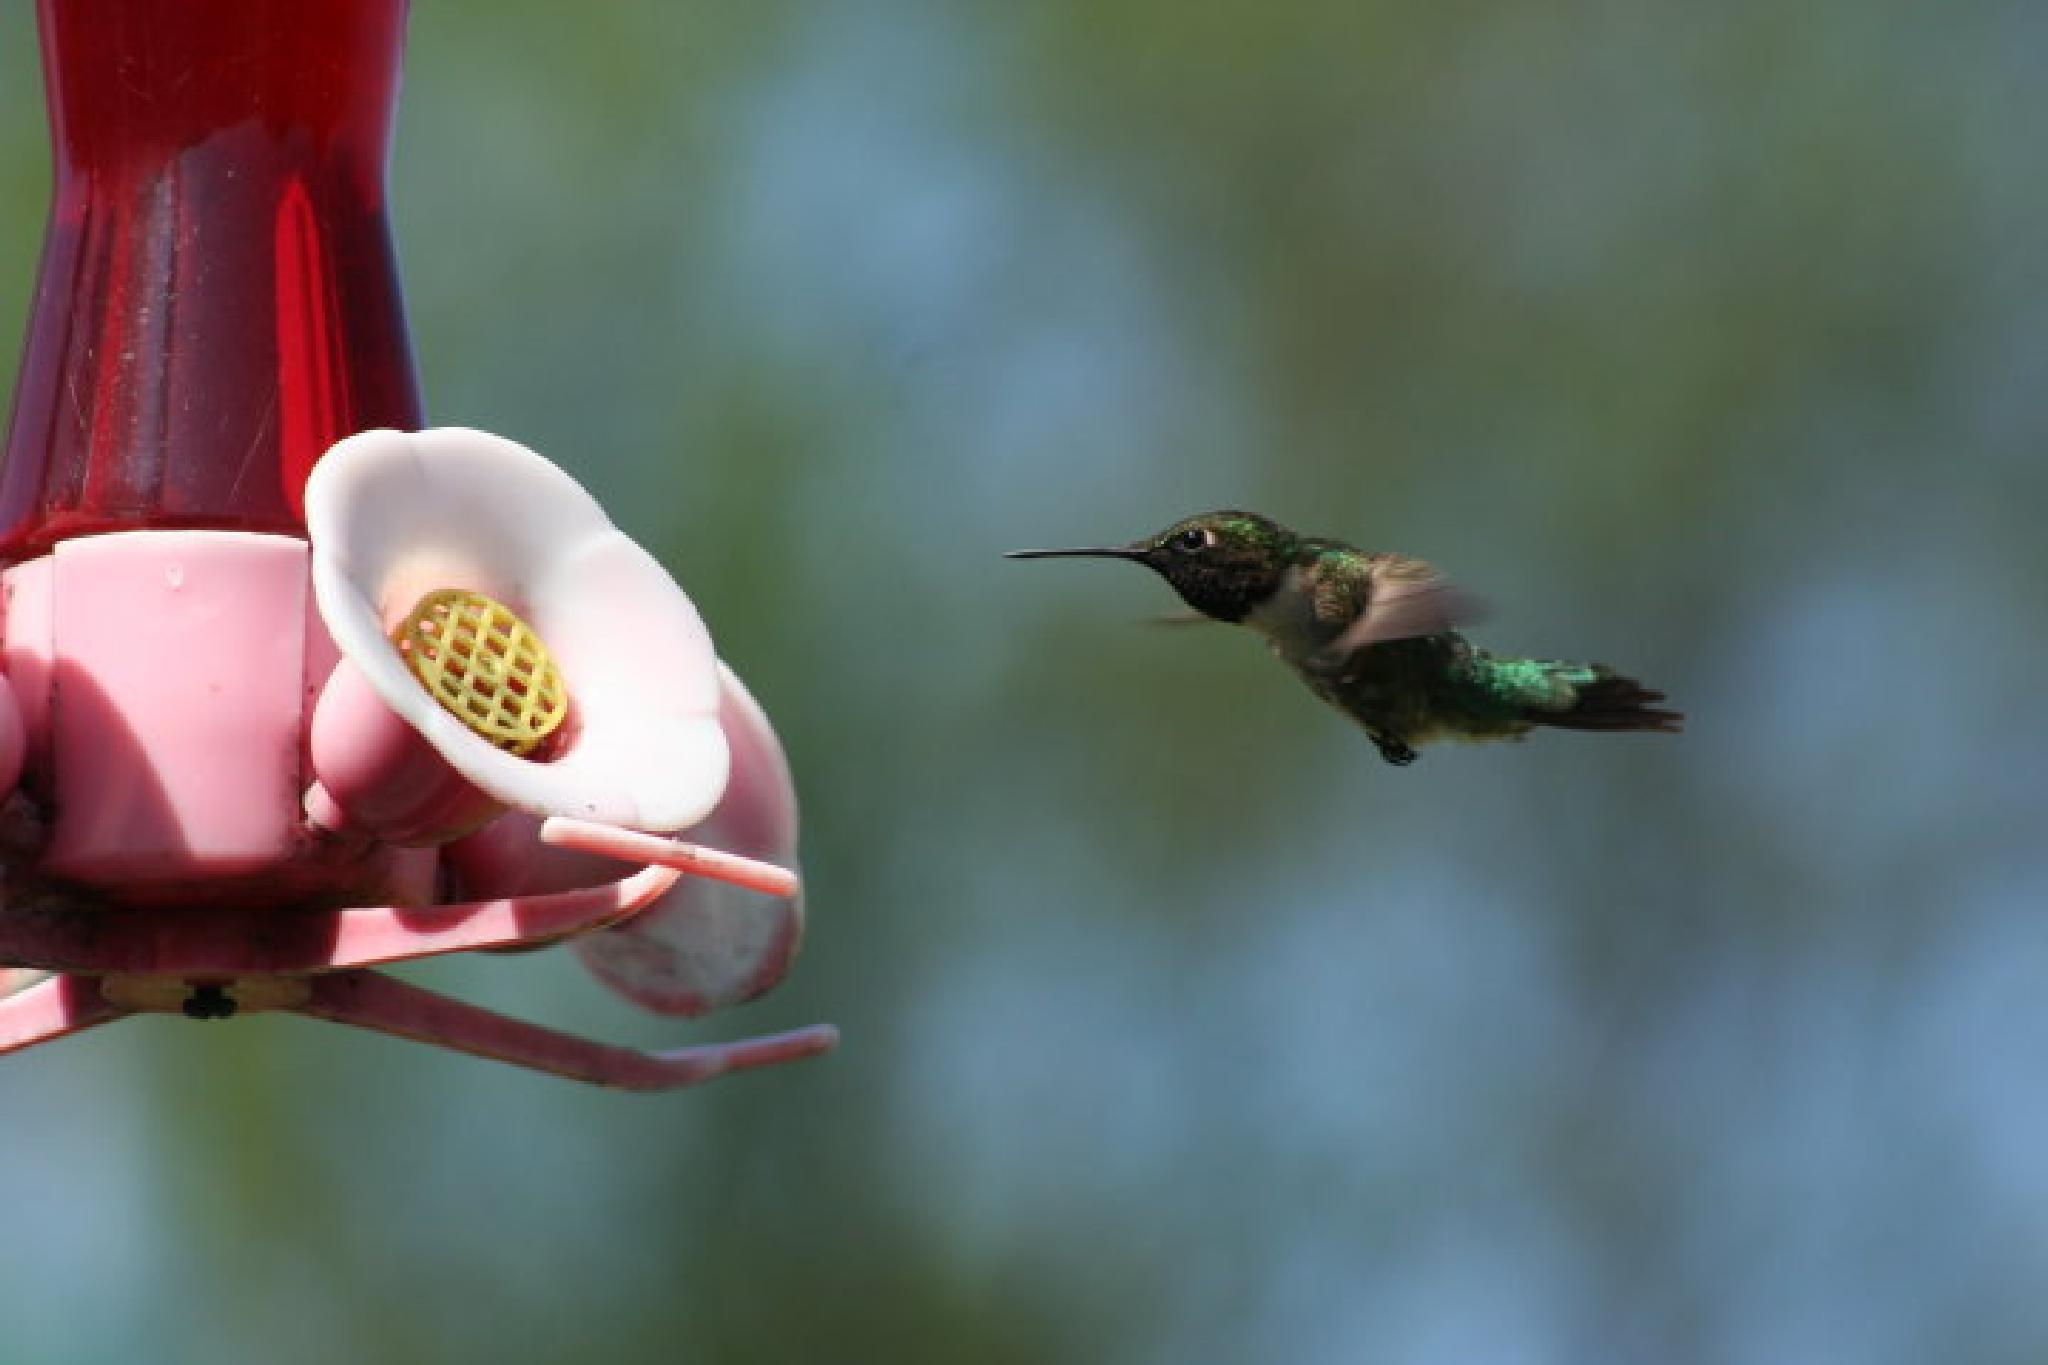 Feeding Hummingbard by alamaude